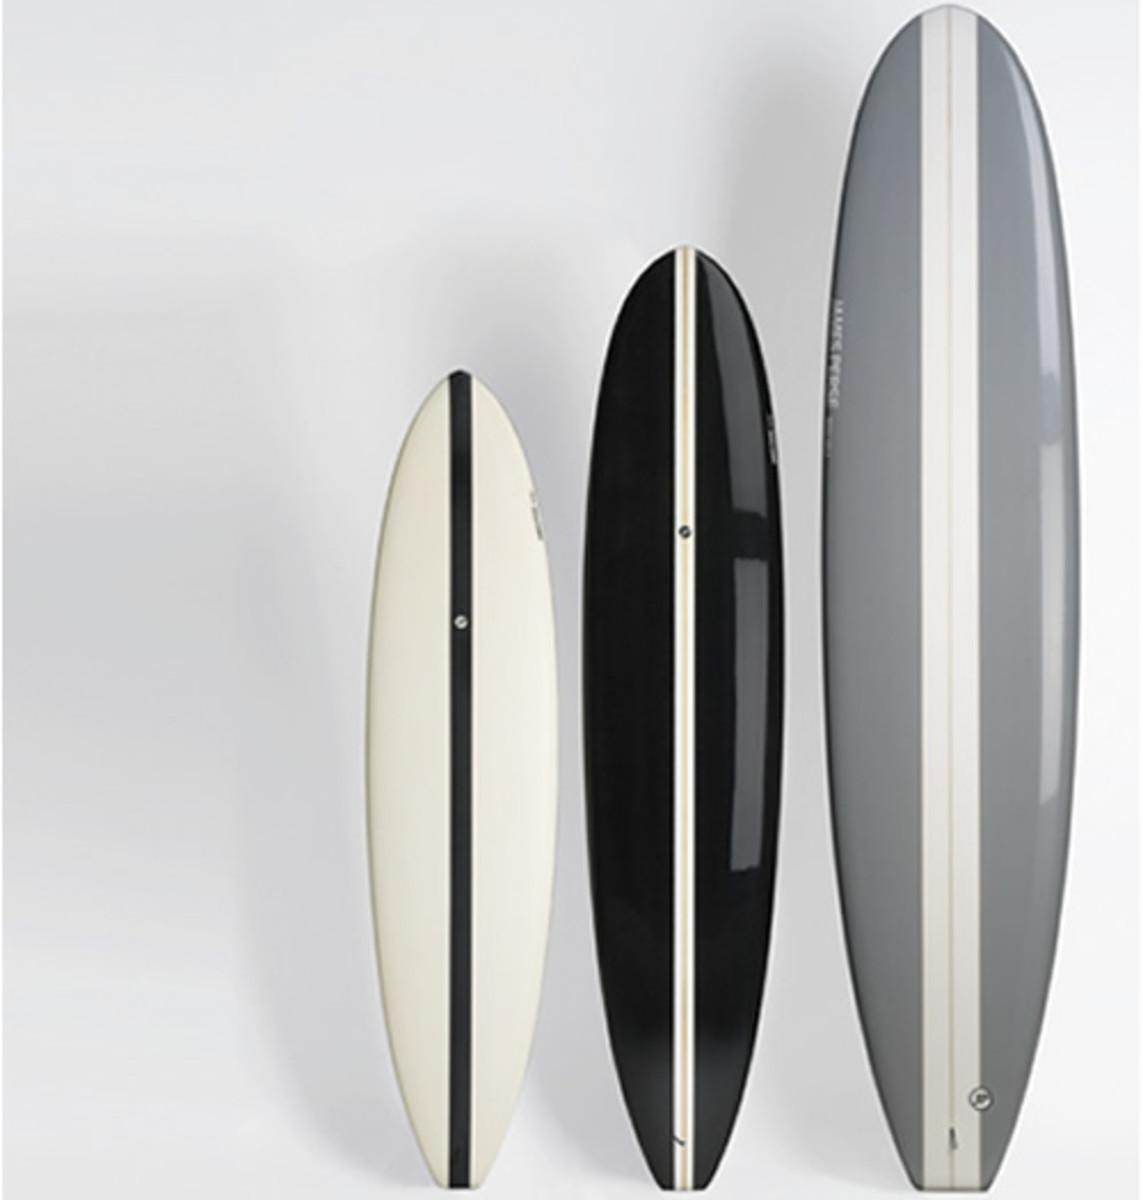 jpsurf